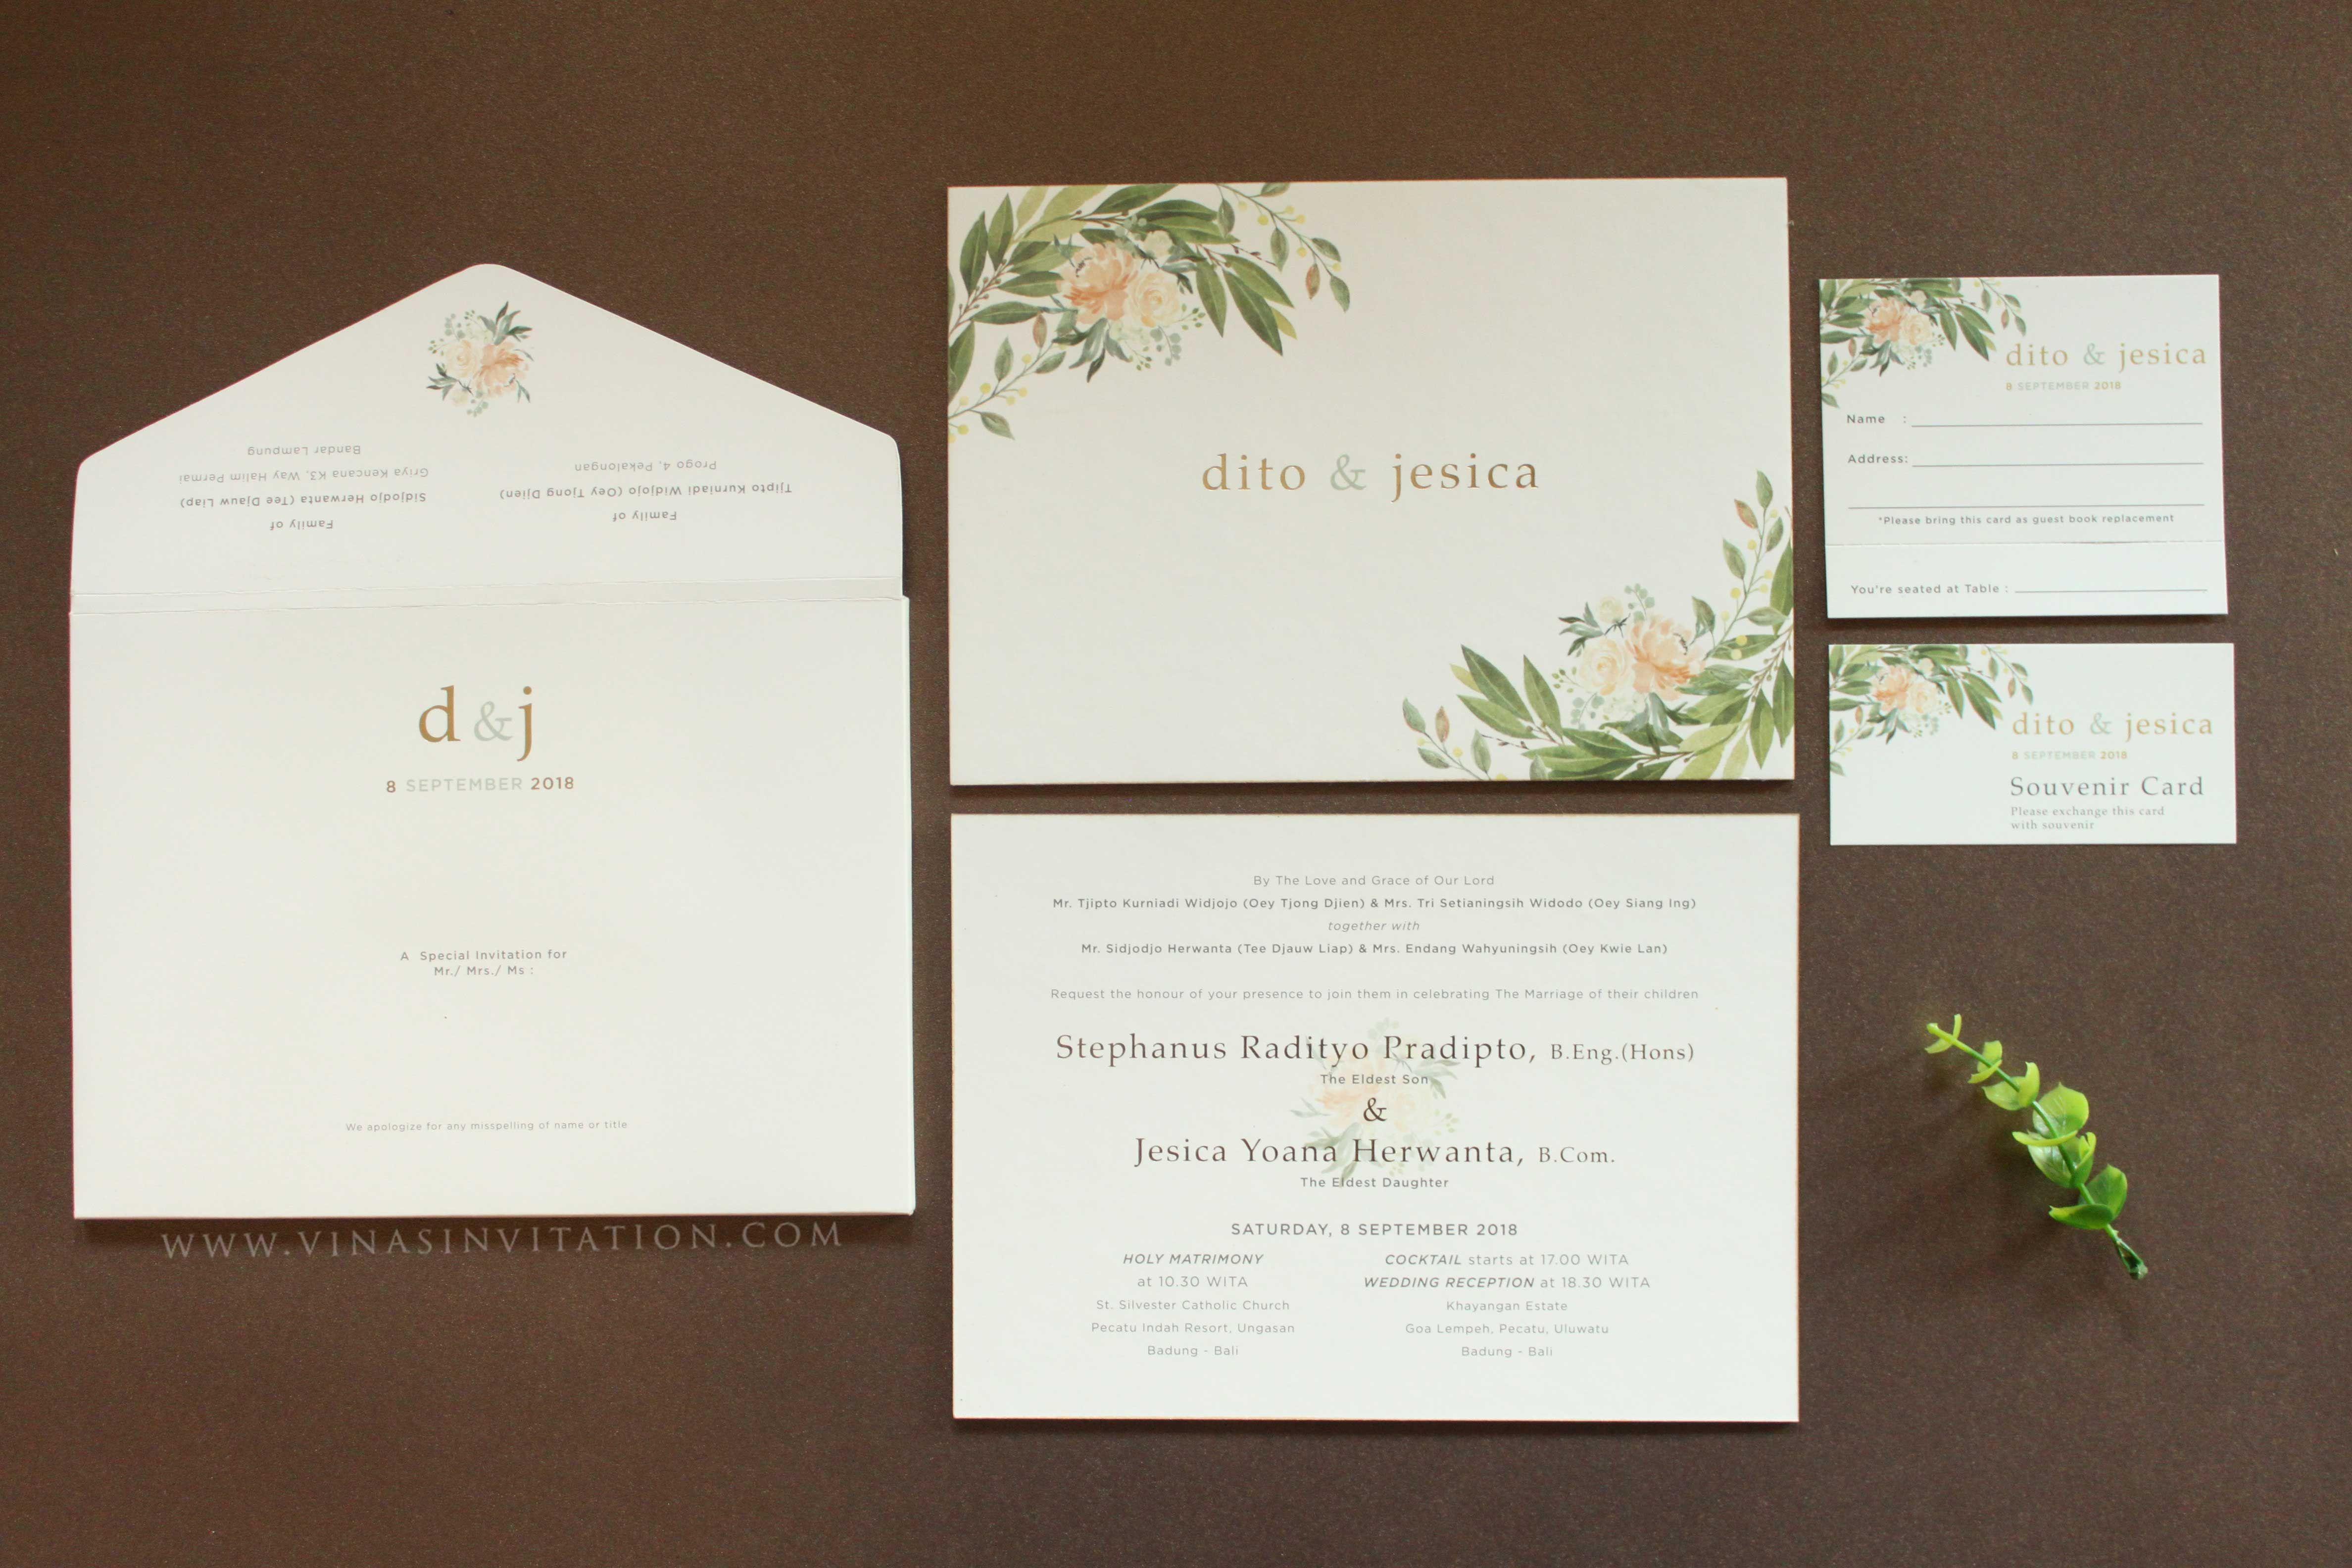 Wedding Invitations Sydney: Vinas Invitation. Flower Theme Invitation. Floral Theme